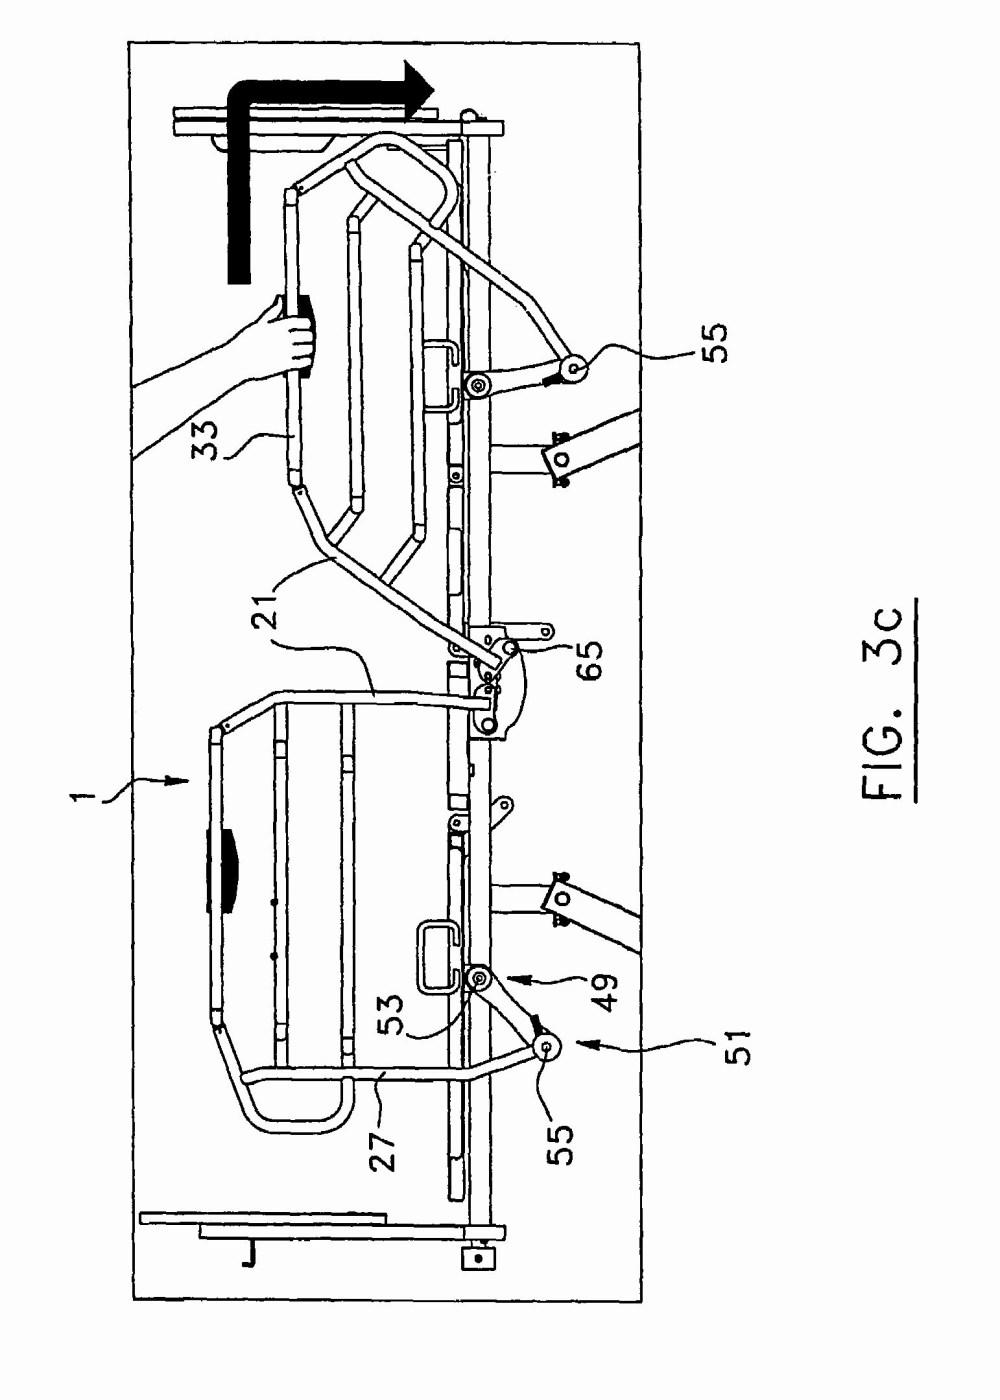 medium resolution of gm internal regulator alternator wiring wiring diagram gm alternator wiring diagram internal regulator